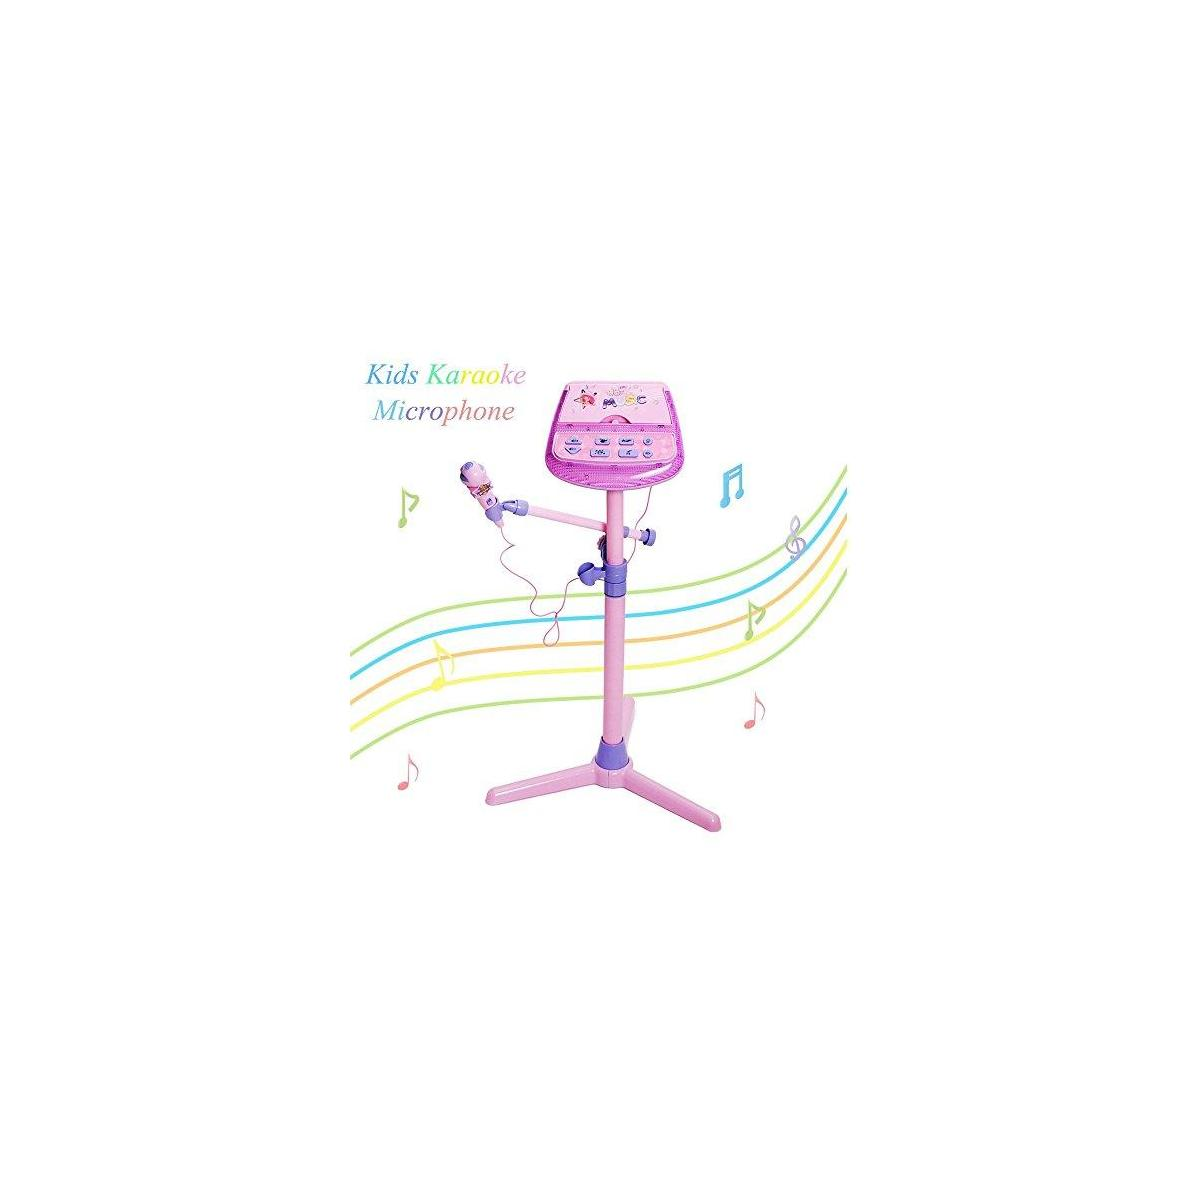 Happytime Kids Karaoke Microphone Musical Toys Adjustable Stand Karaoke Machine with Pink External Music Function & Flashing Lights for Kids